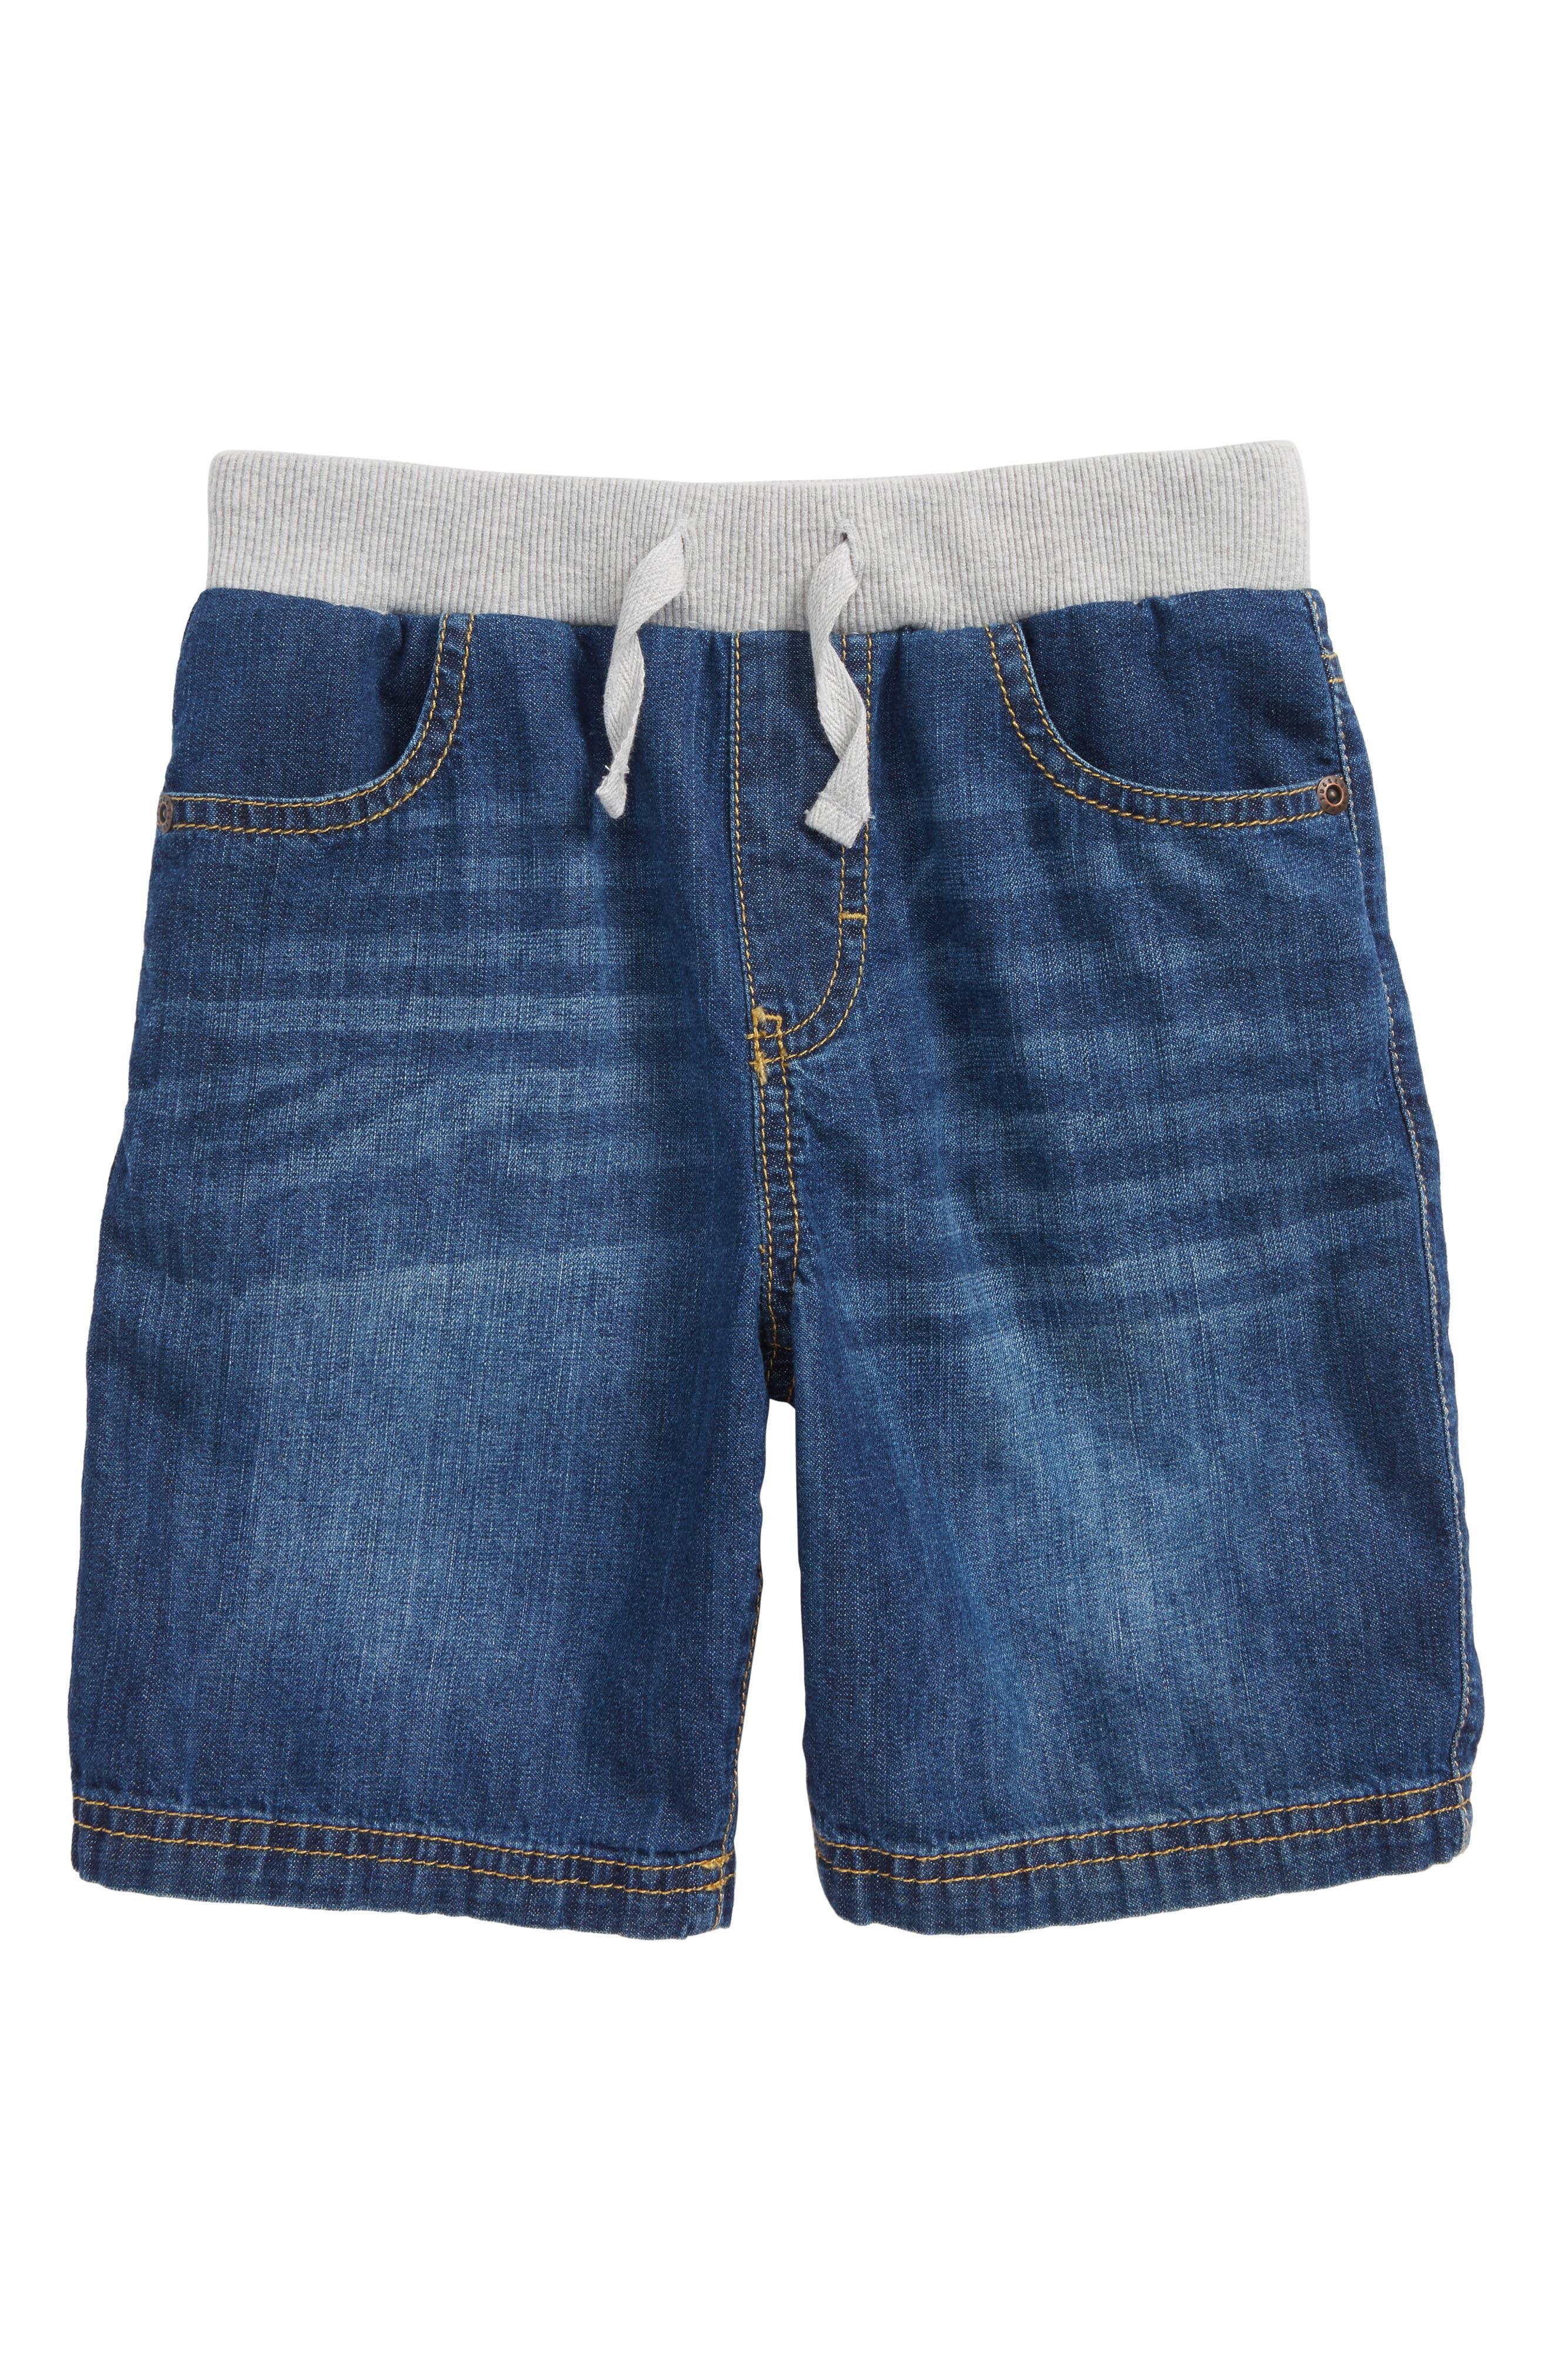 Denim Shorts,                         Main,                         color,